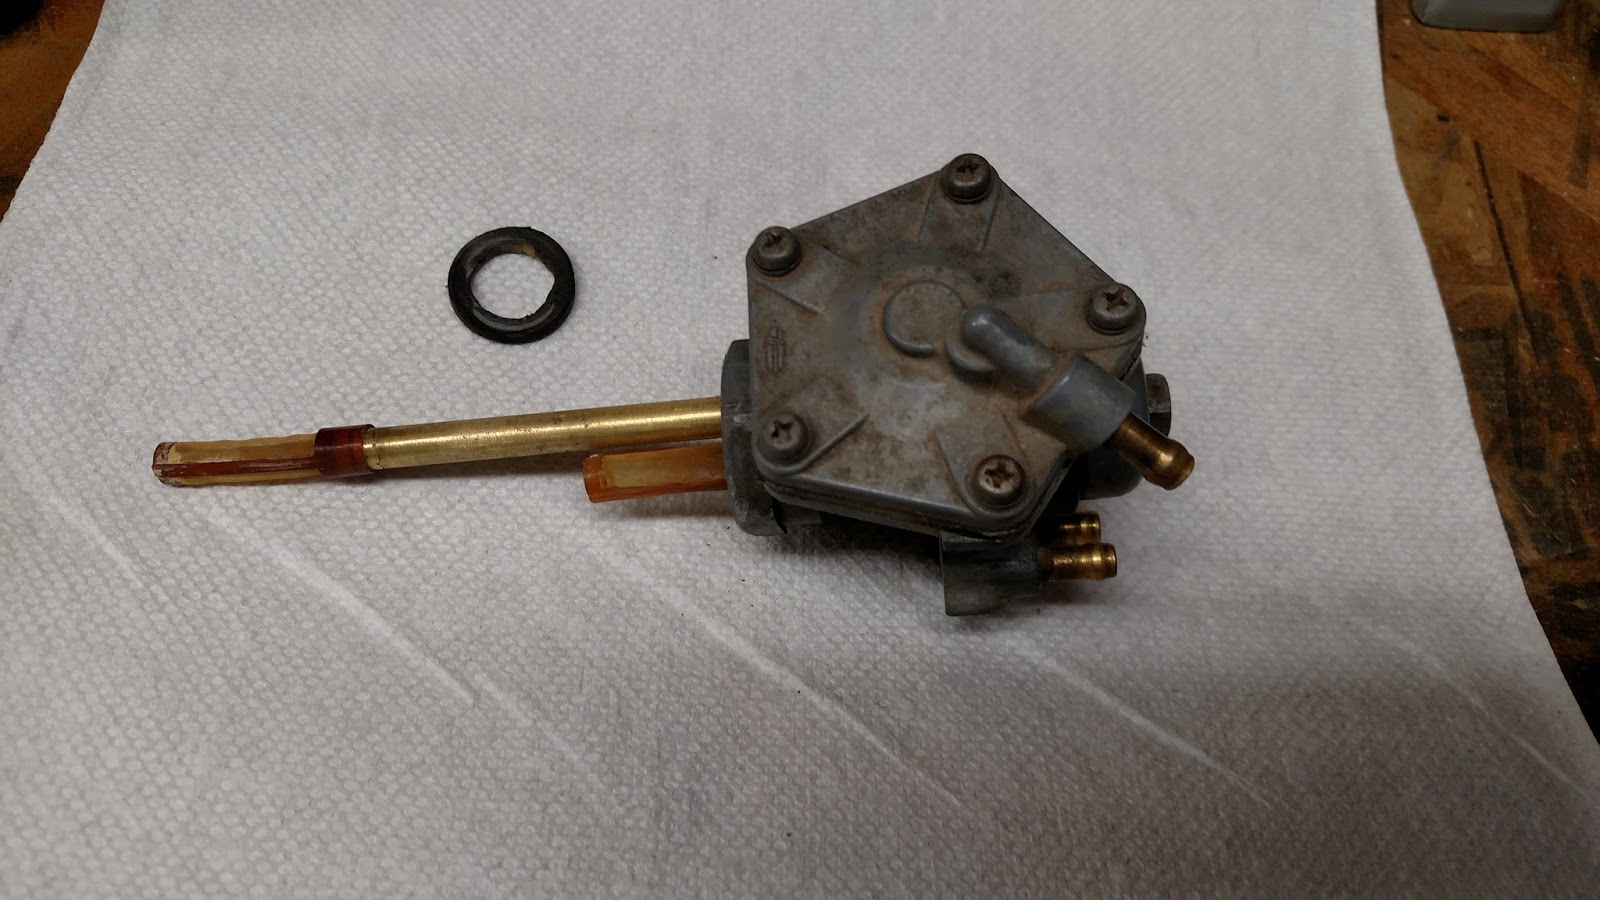 Spud's blog: KH500 Refurbishment - Fuel/Air System work